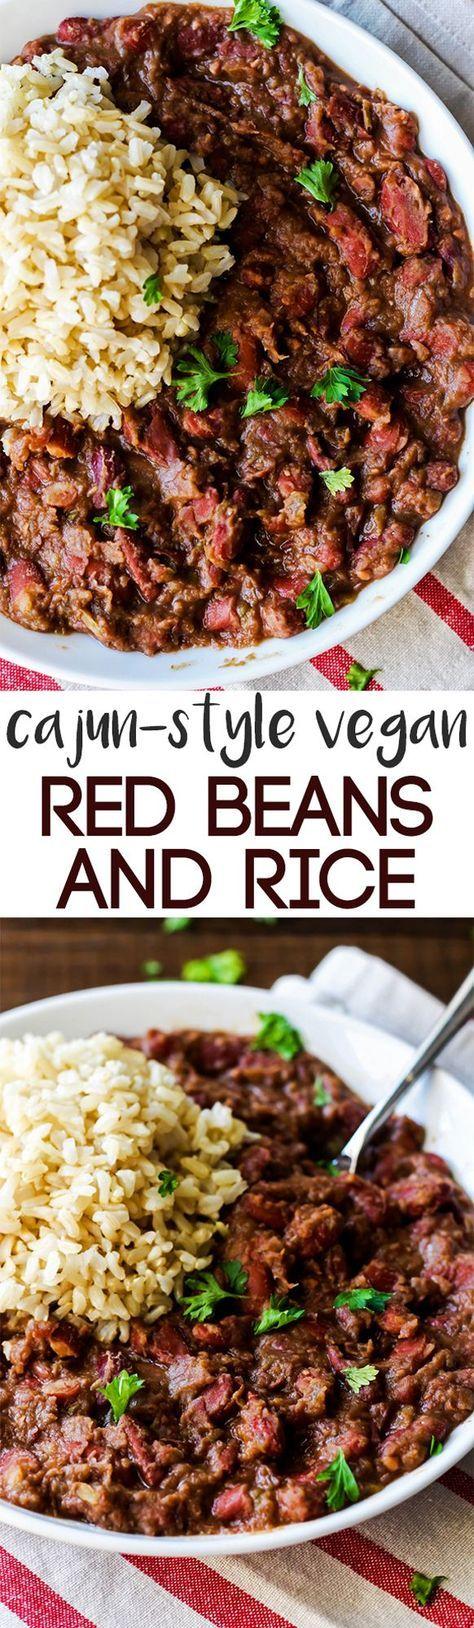 Dinner Recipe: Cajun-Style Vegan Red Beans & Rice #vegan #glutenfree #recipes #healthy #plantbased #whatveganseat